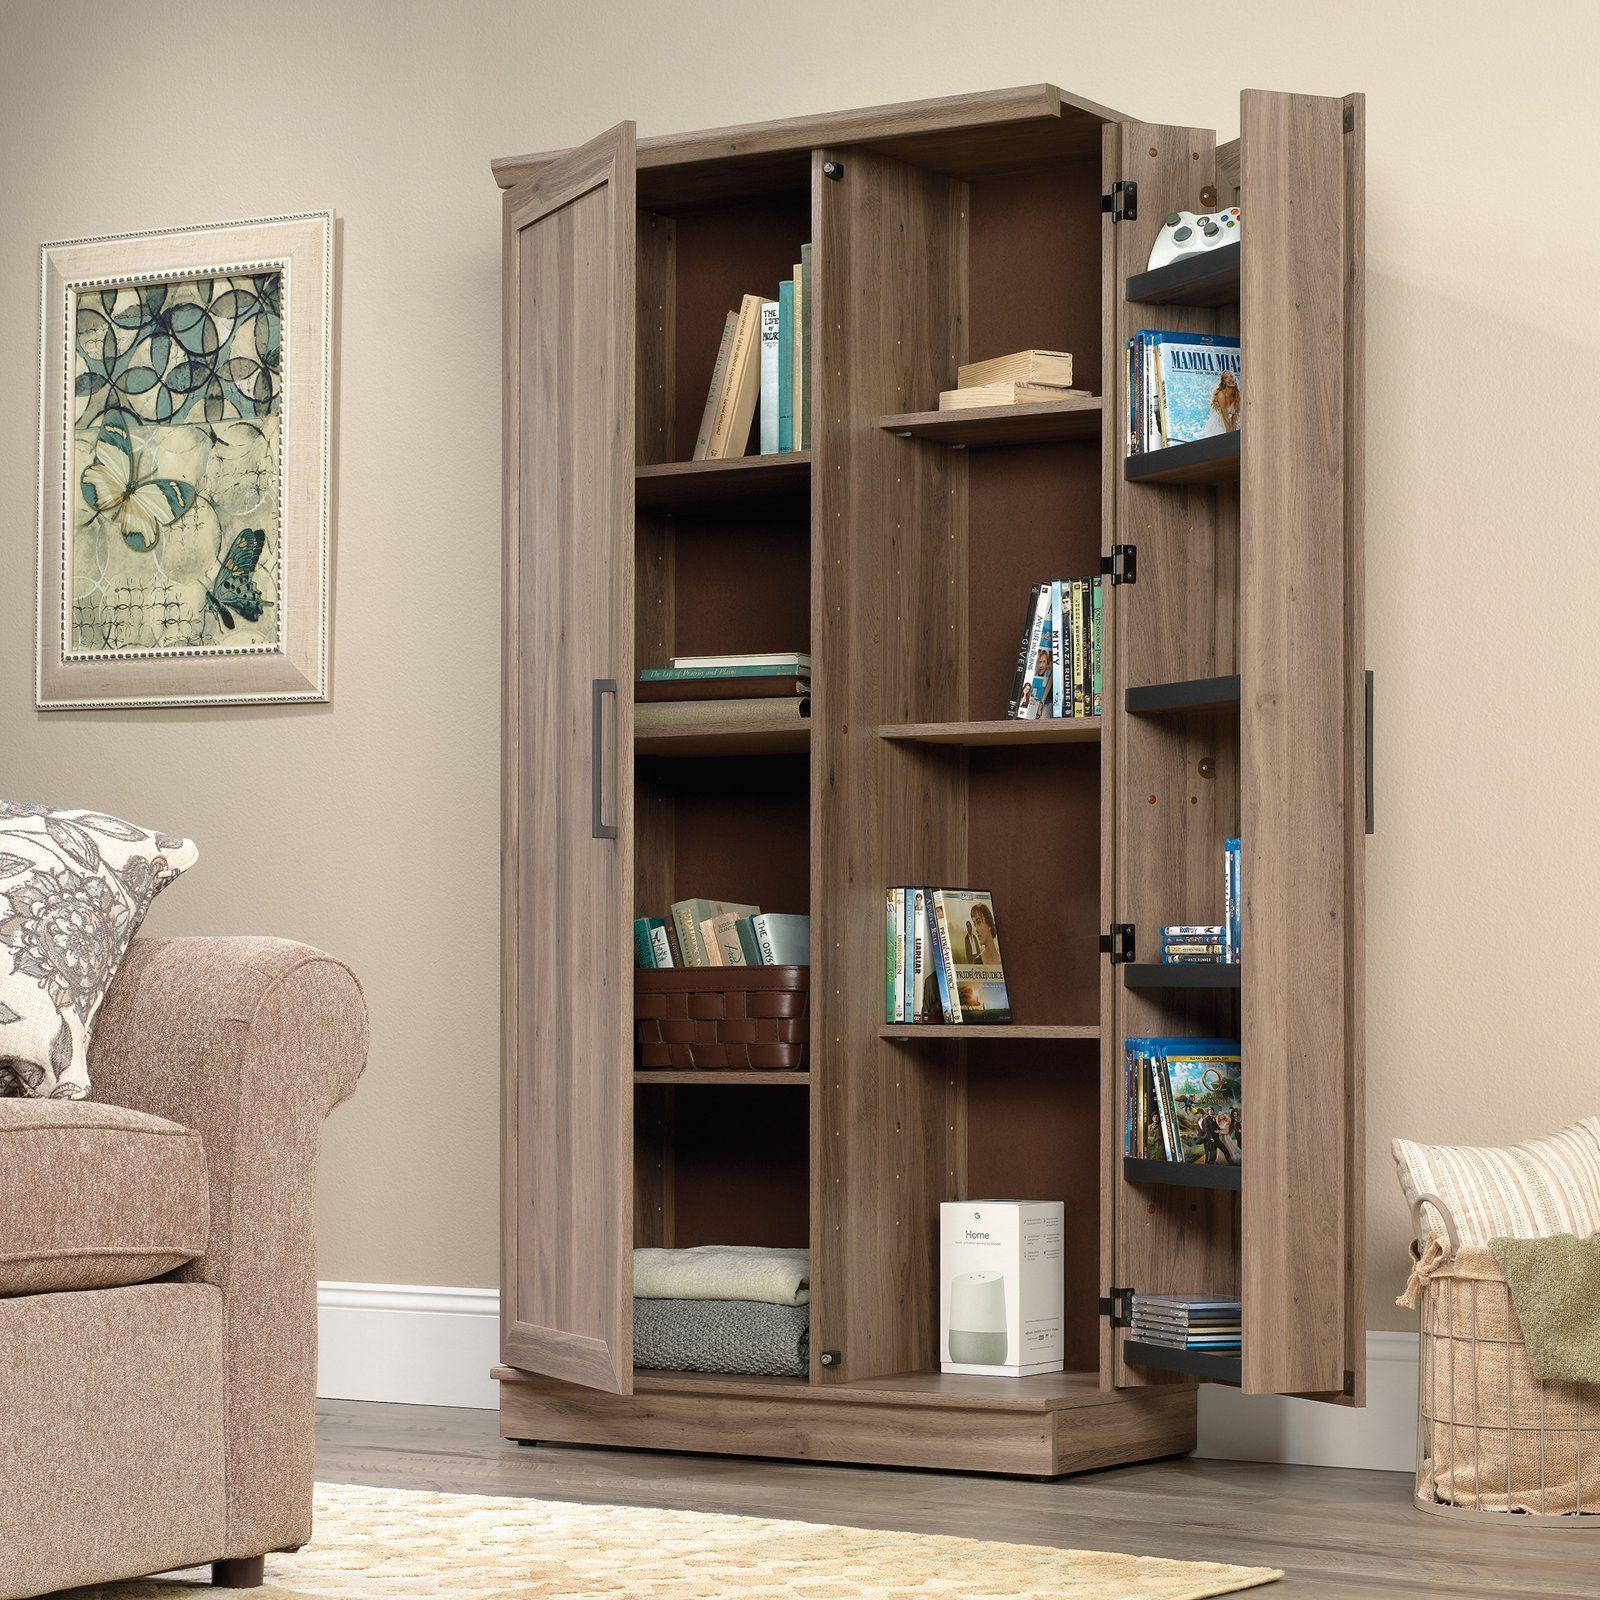 Sauder Homeplus Pantry Storage Cabinet Pantry Storage Cabinet Kitchen Cabinet Storage Pantry Storage